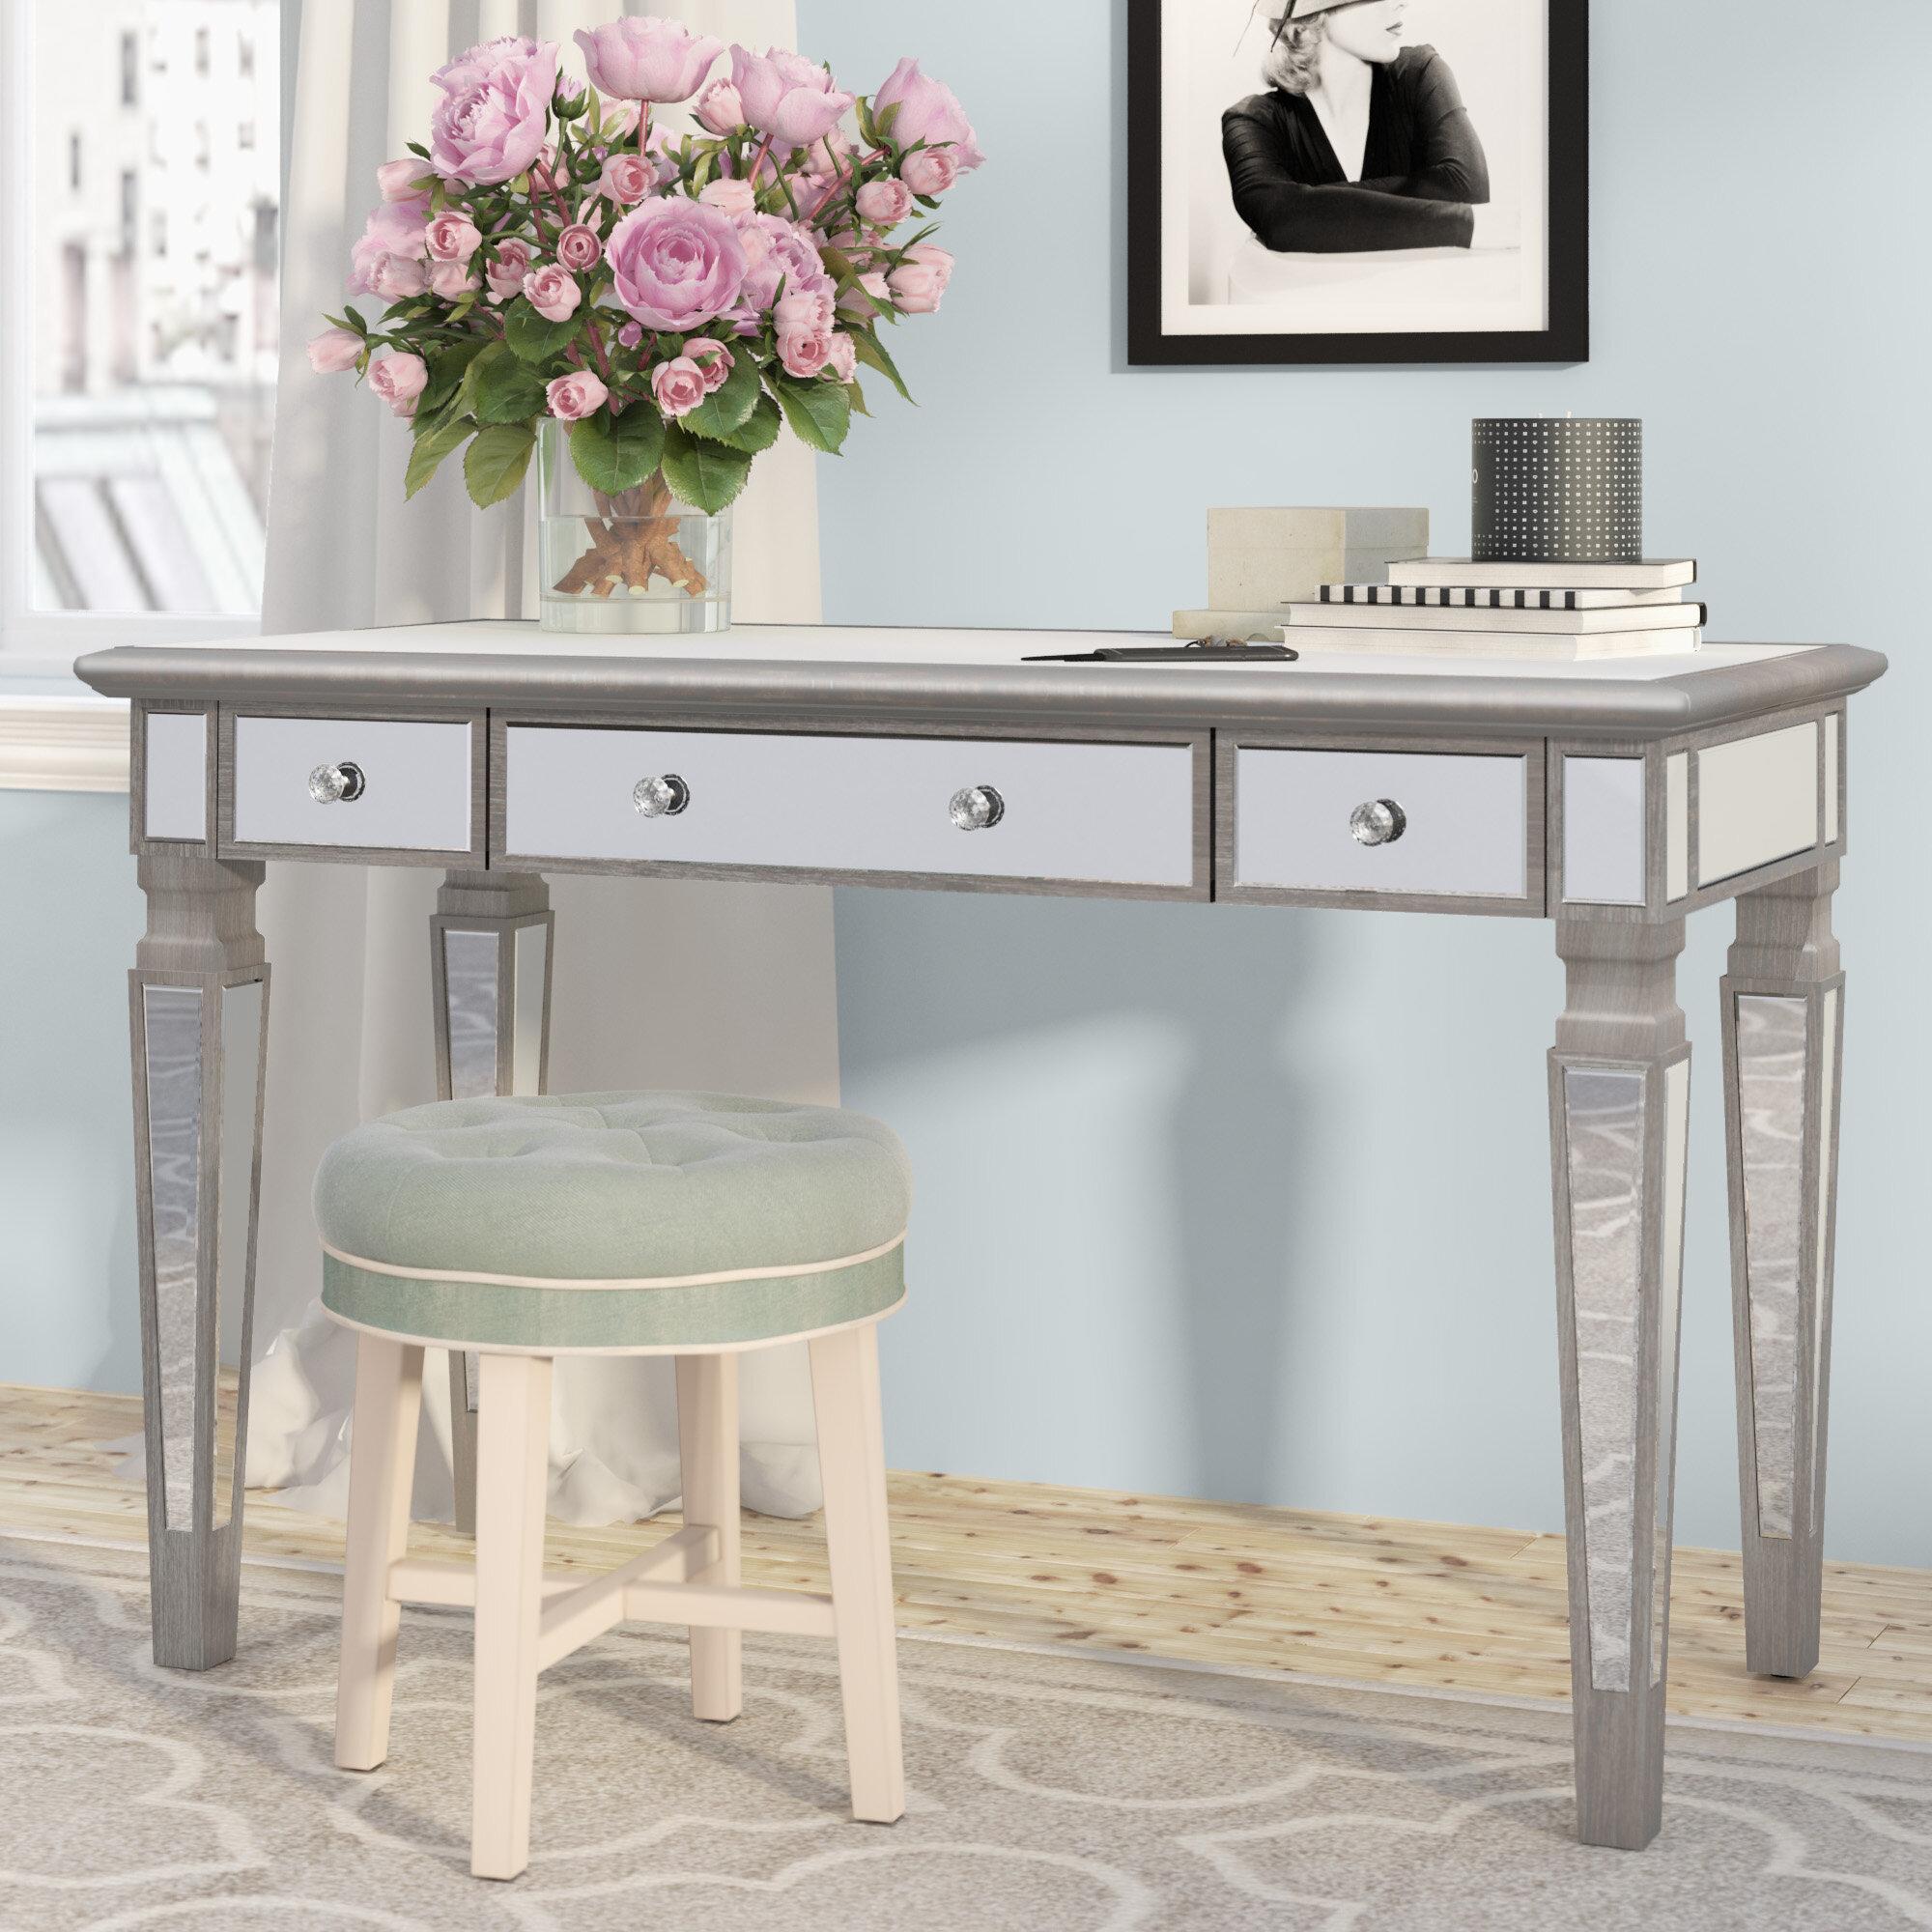 willa arlo interiors angelette glass writing desk reviews wayfair rh wayfair com glass and chrome writing desk glass writing desk ikea